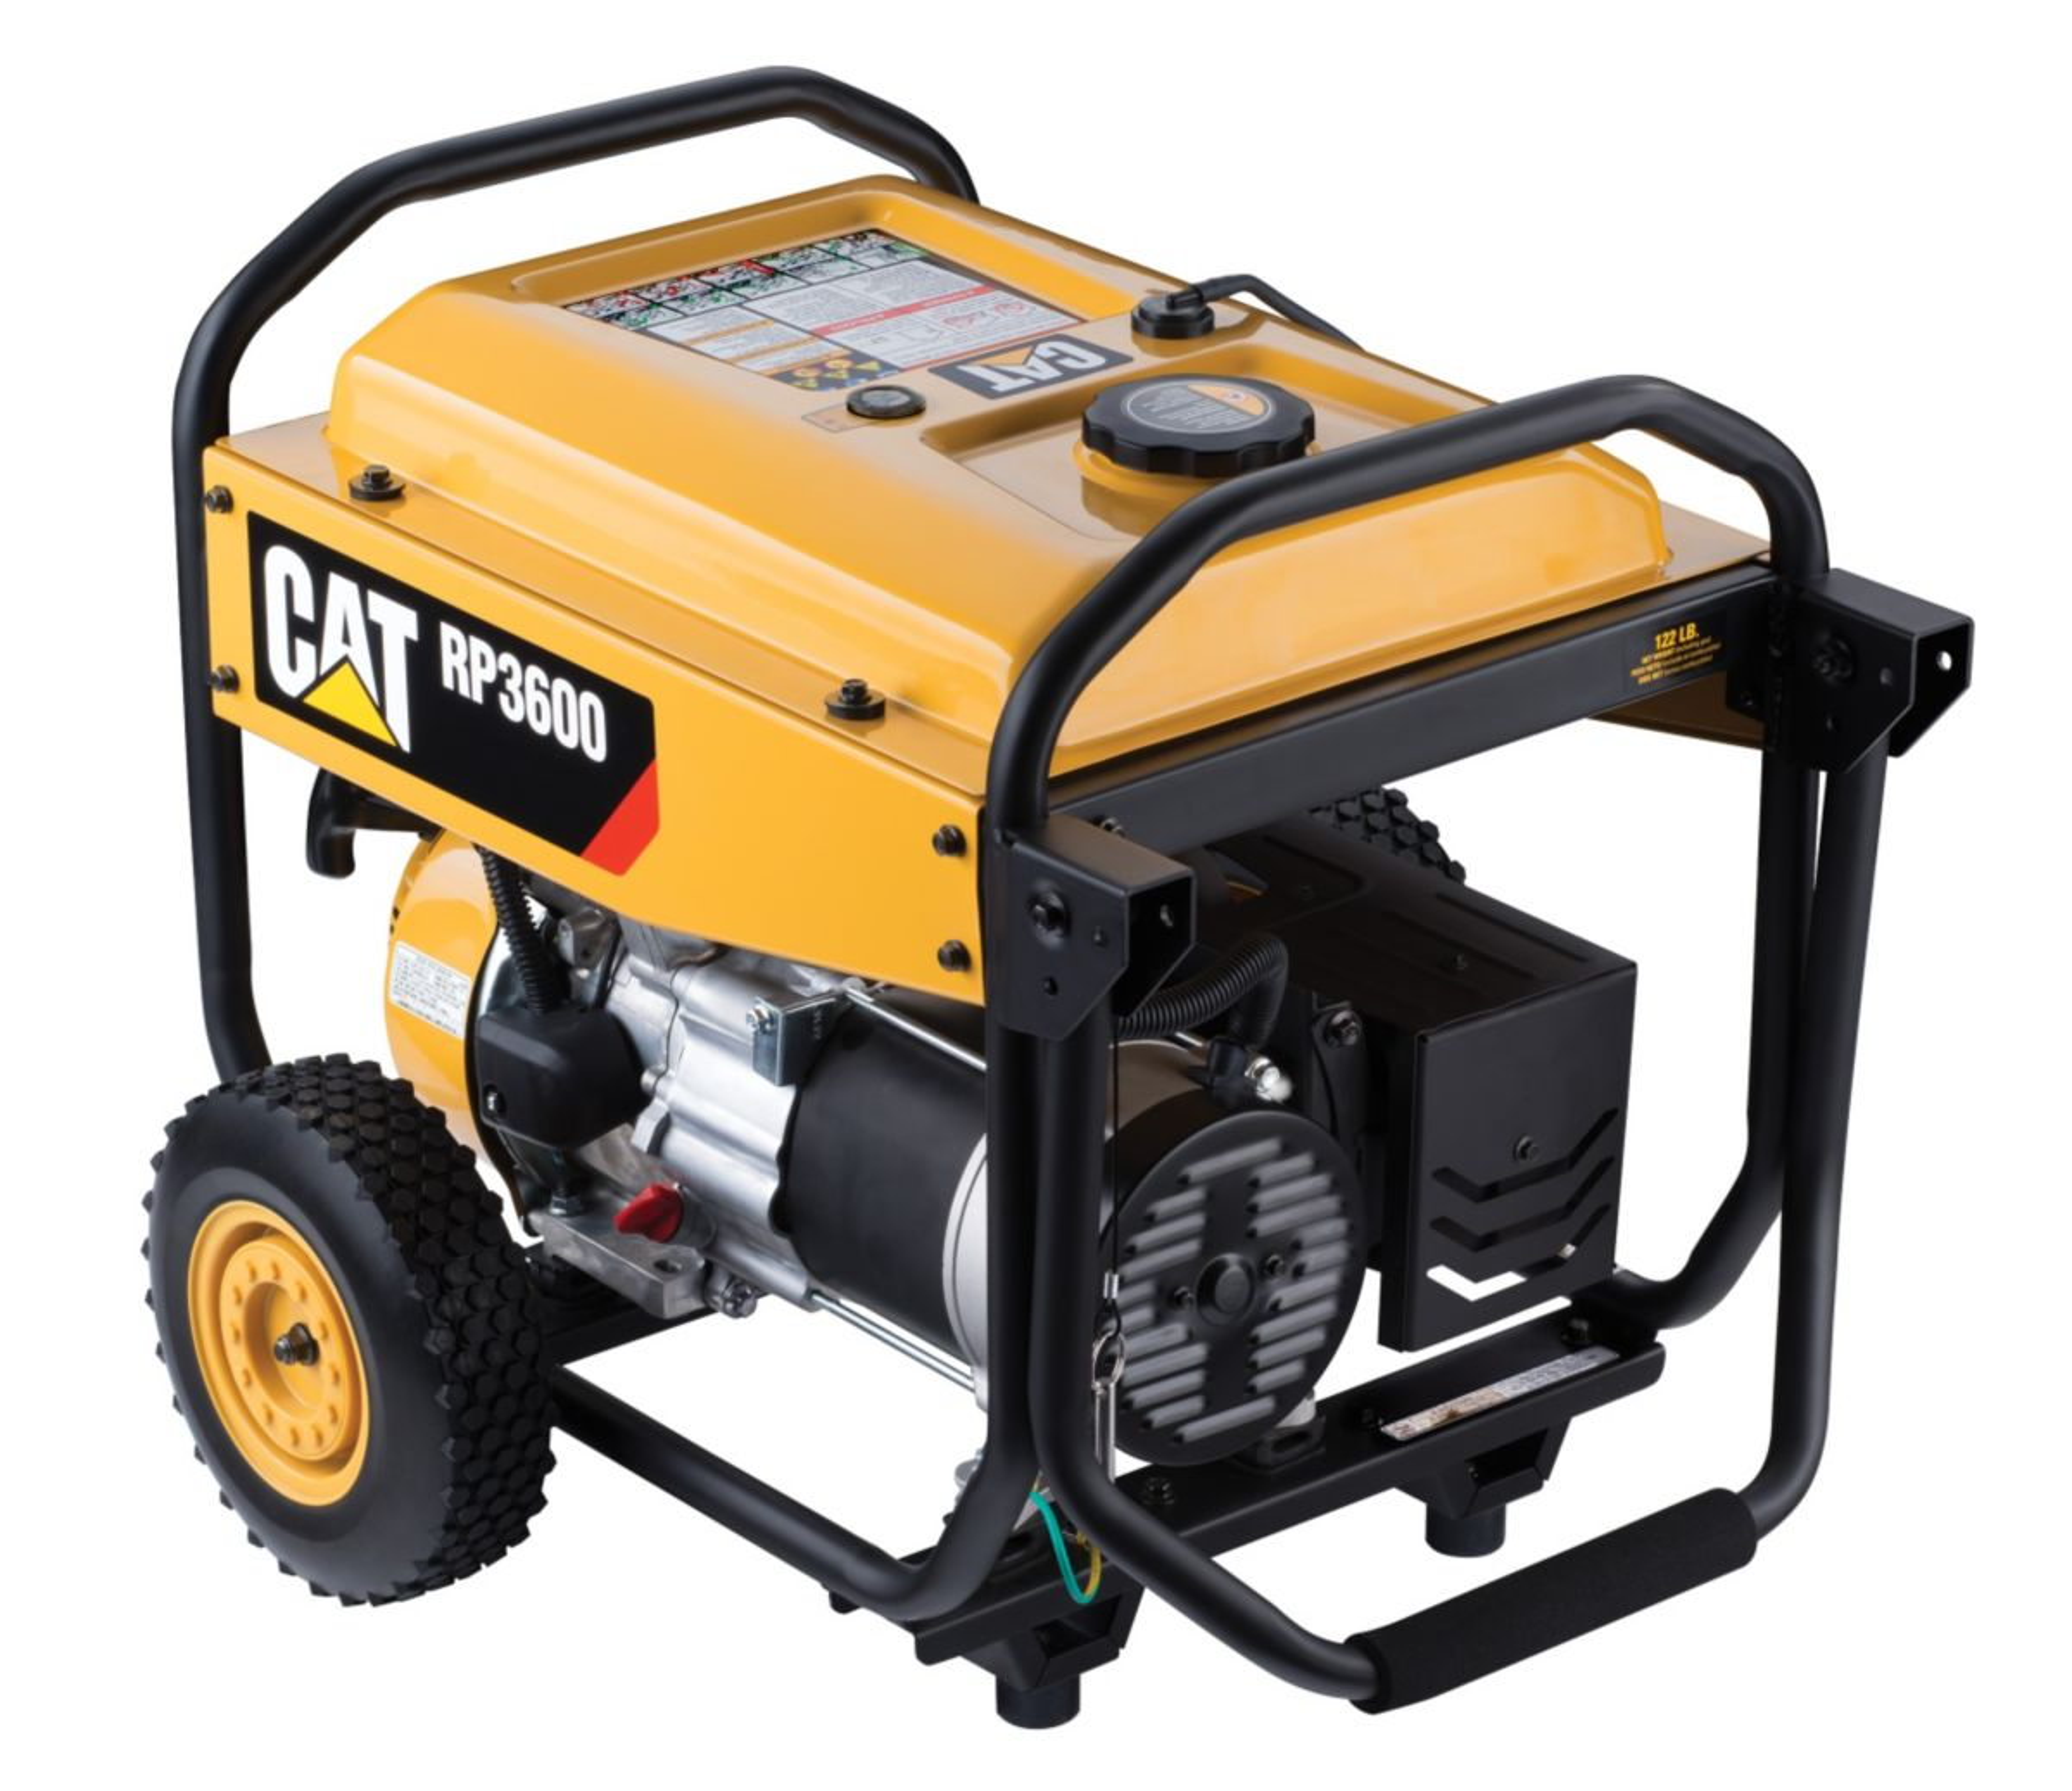 New Rp3600 Portable Generator Equipment Id 1000024746